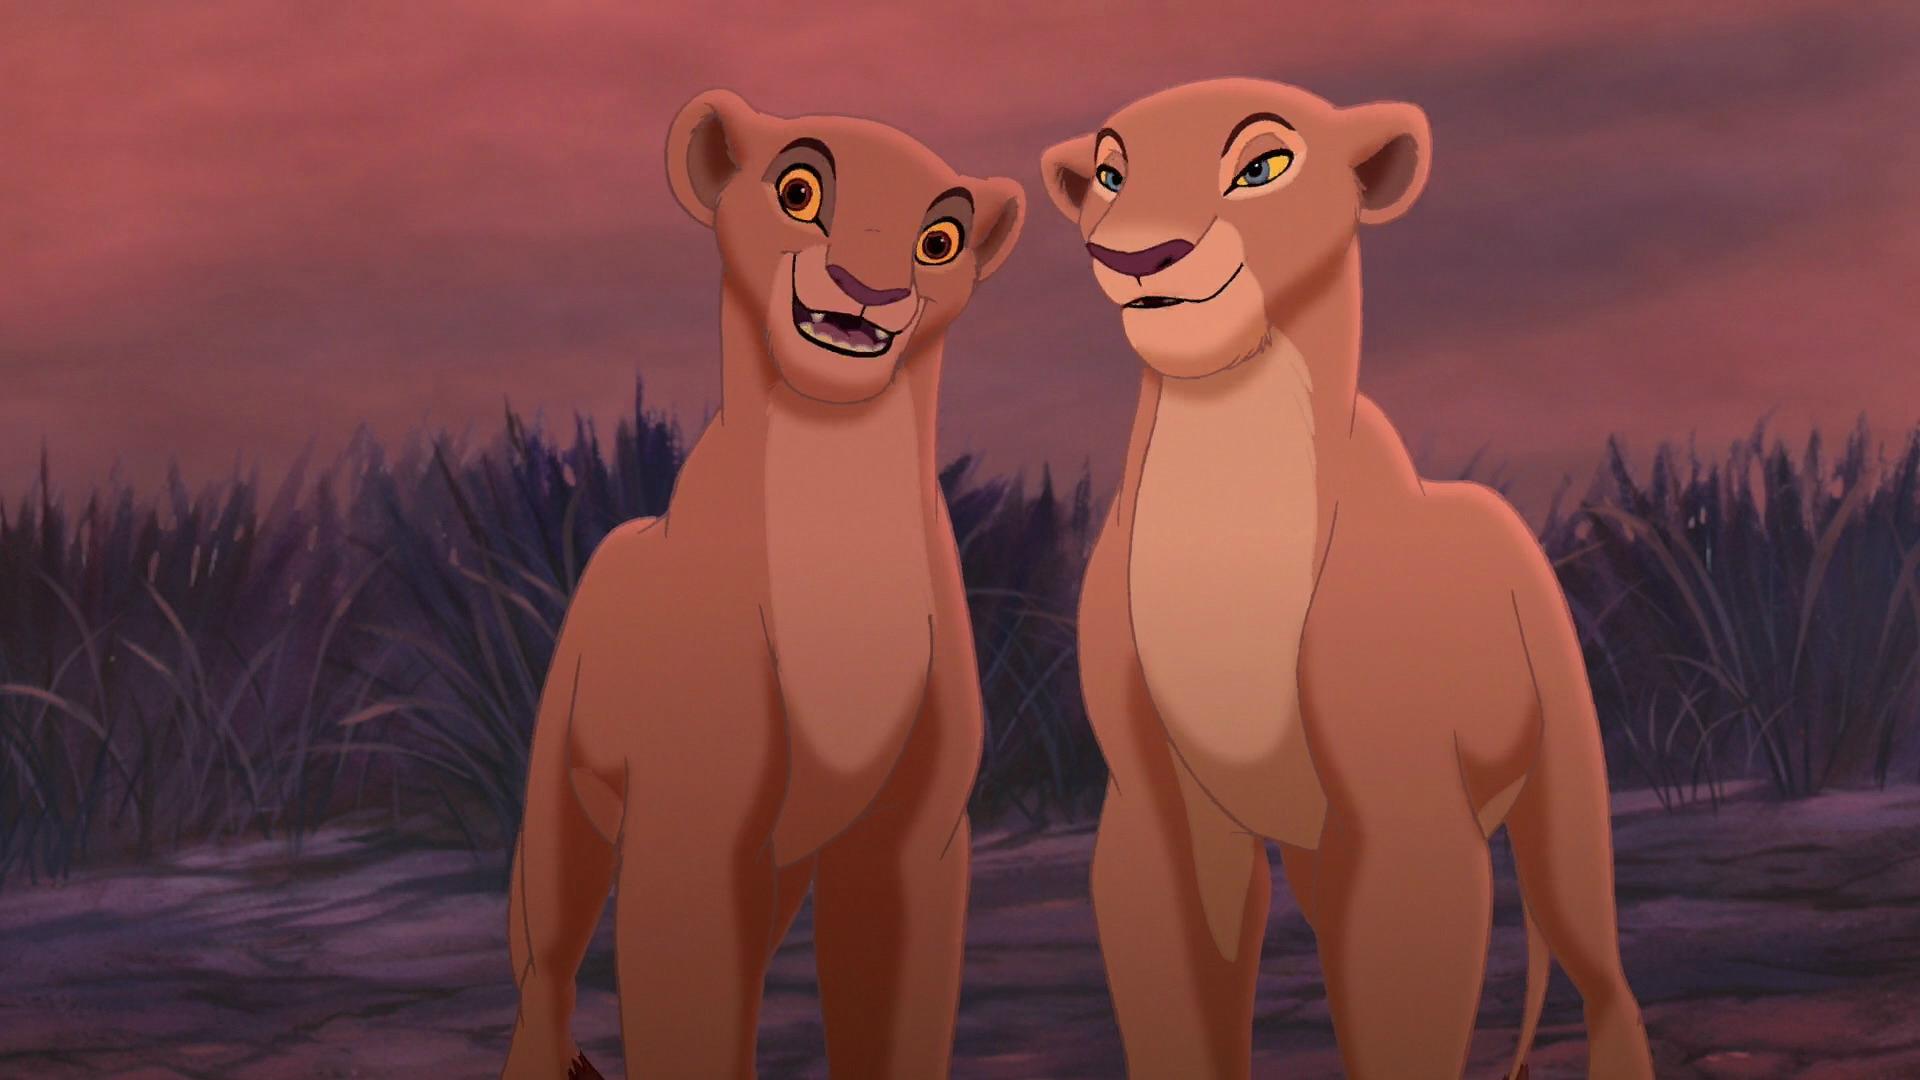 Simba cheats on nala with vitani